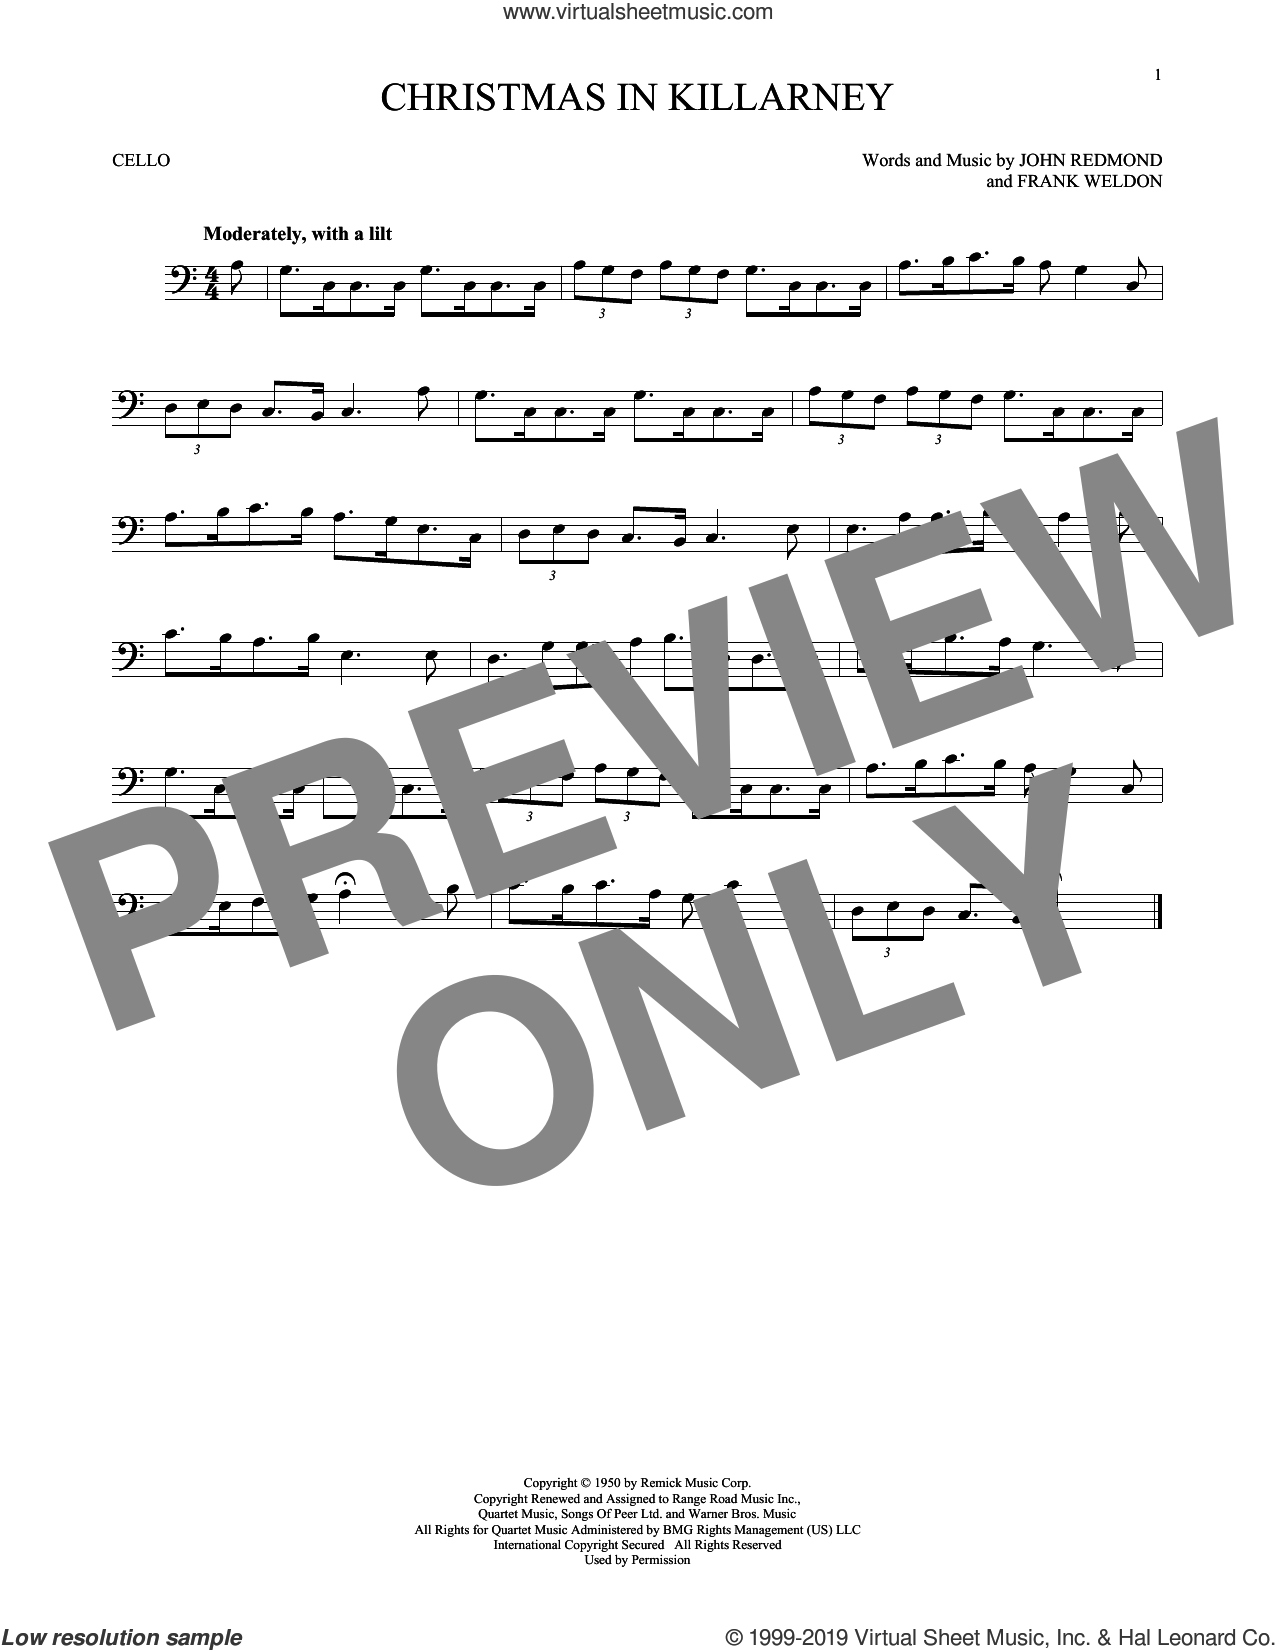 Christmas In Killarney sheet music for cello solo by John Redmond, Frank Weldon and John Redmond & Frank Weldon, intermediate skill level